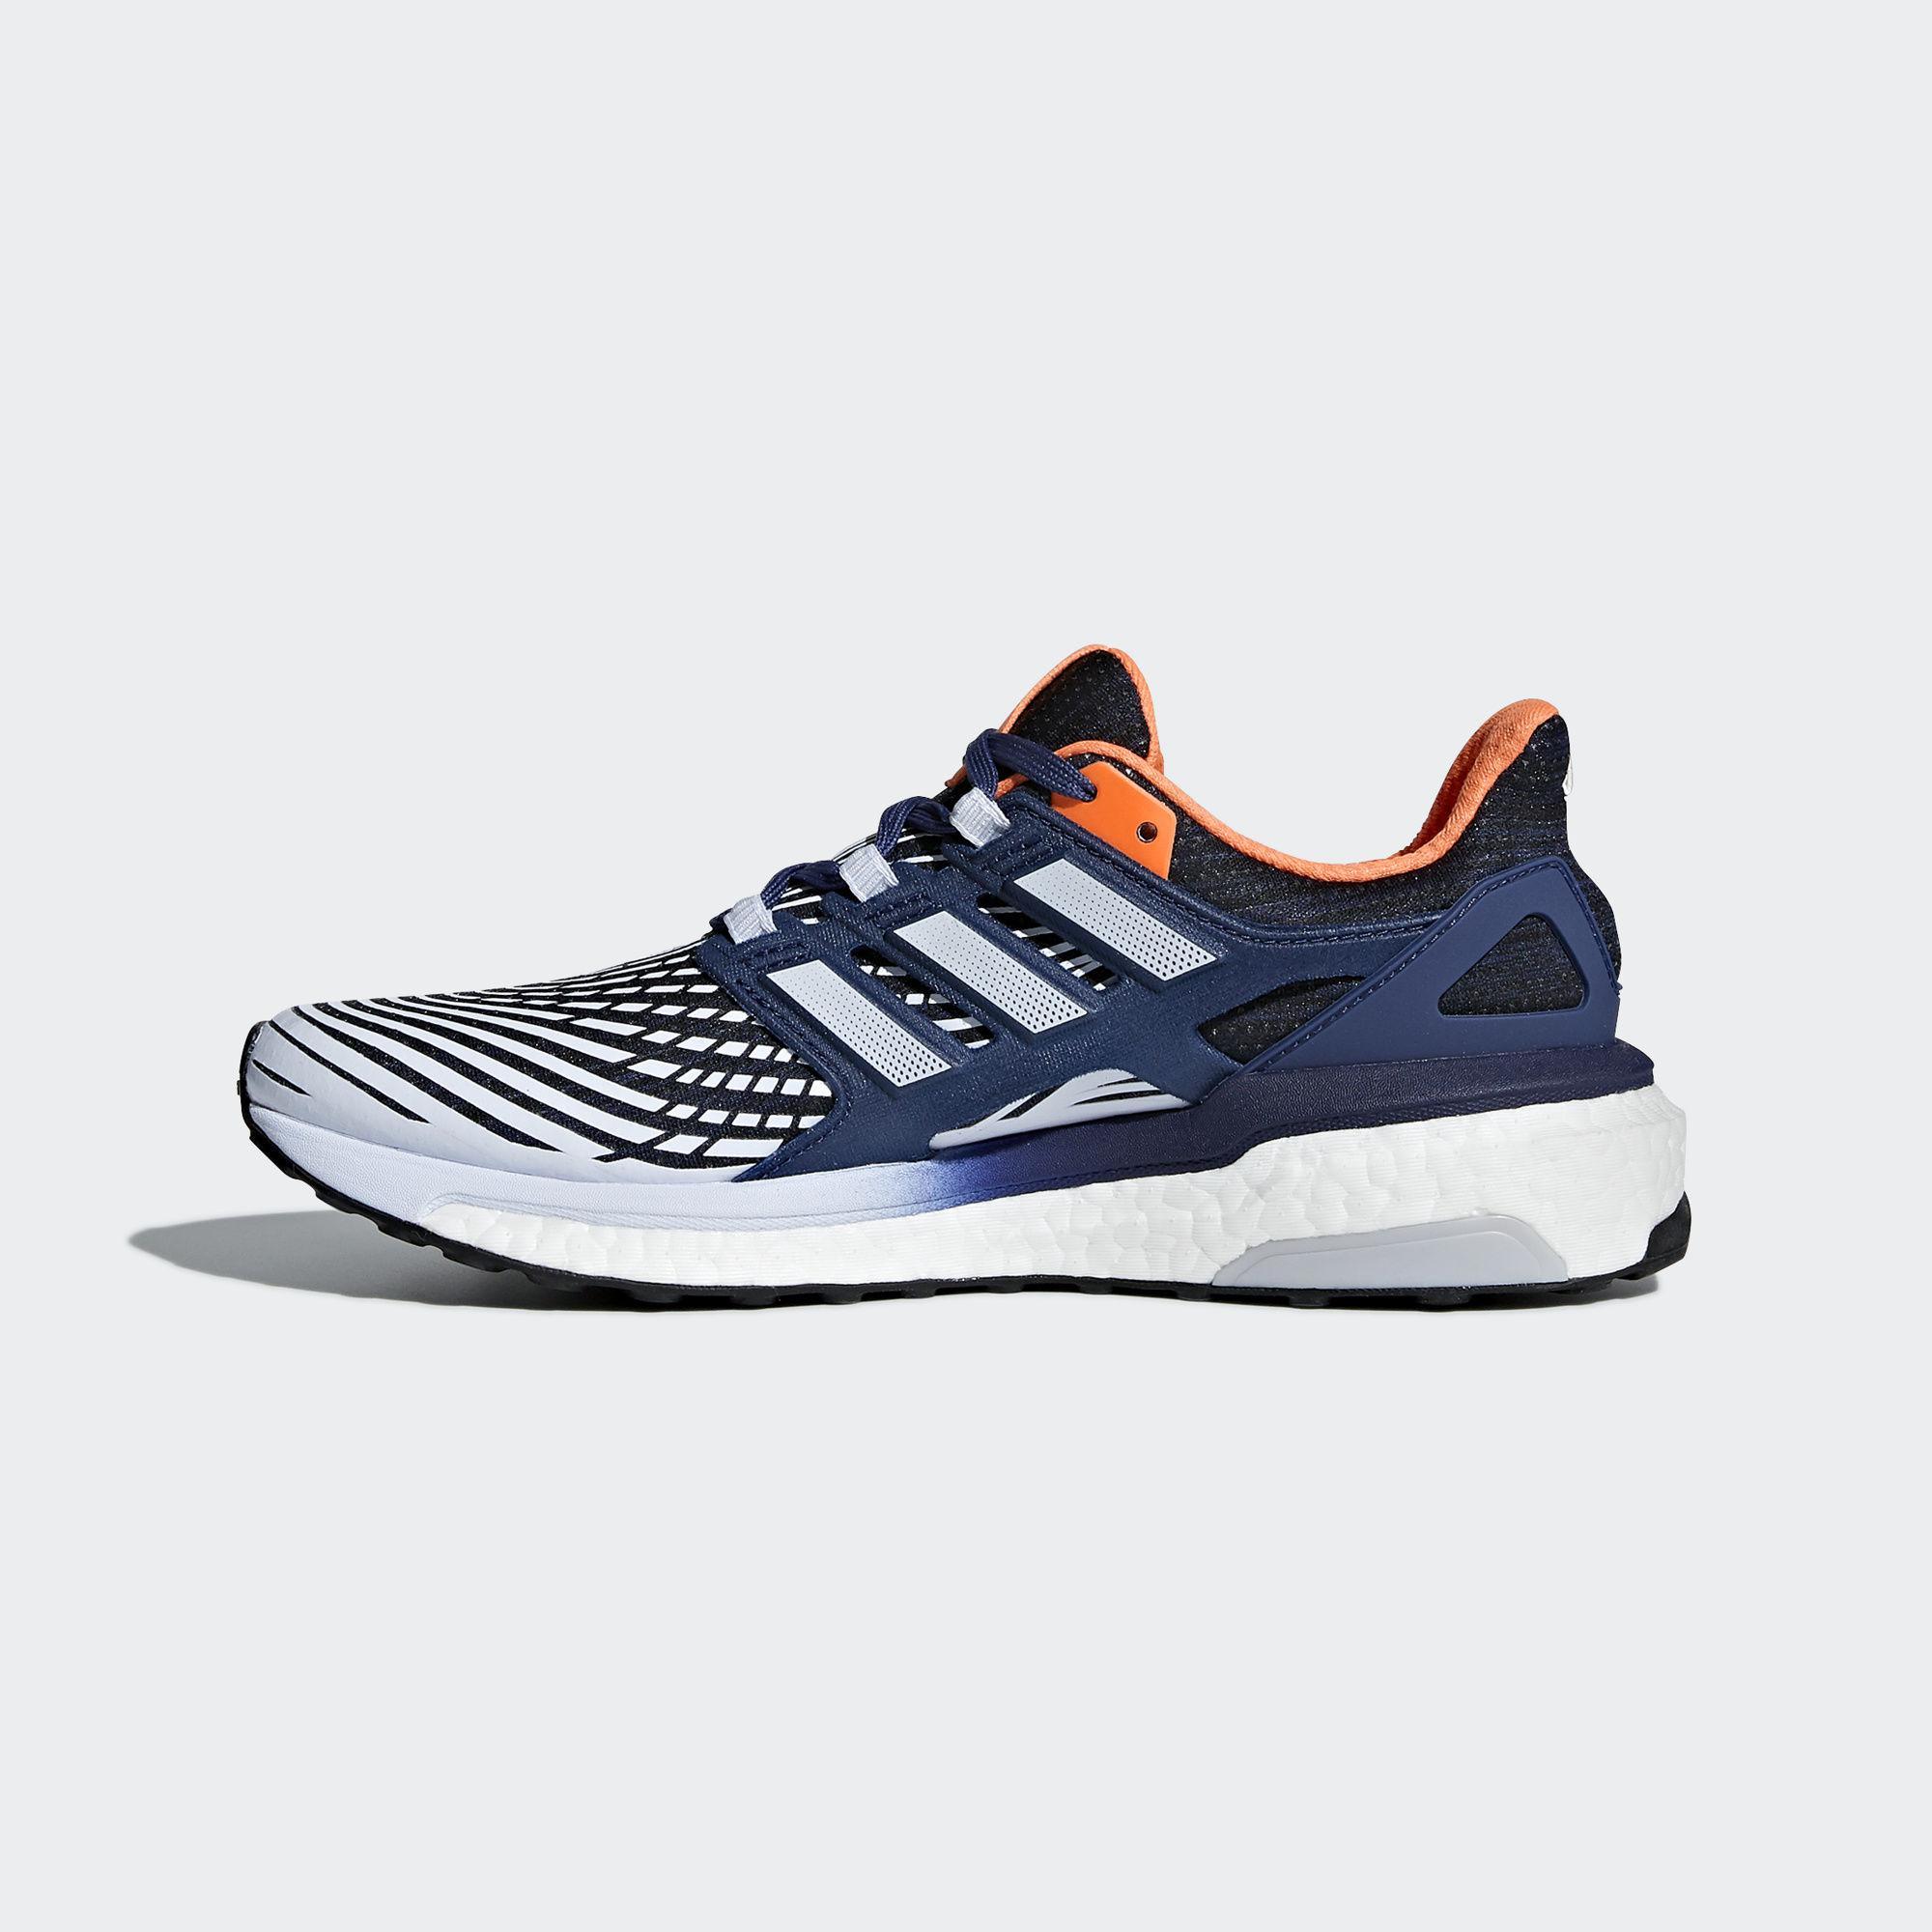 d07bfc3563e8 Adidas Womens Energy Boost Running Shoes - Blue Orange - Tennisnuts.com